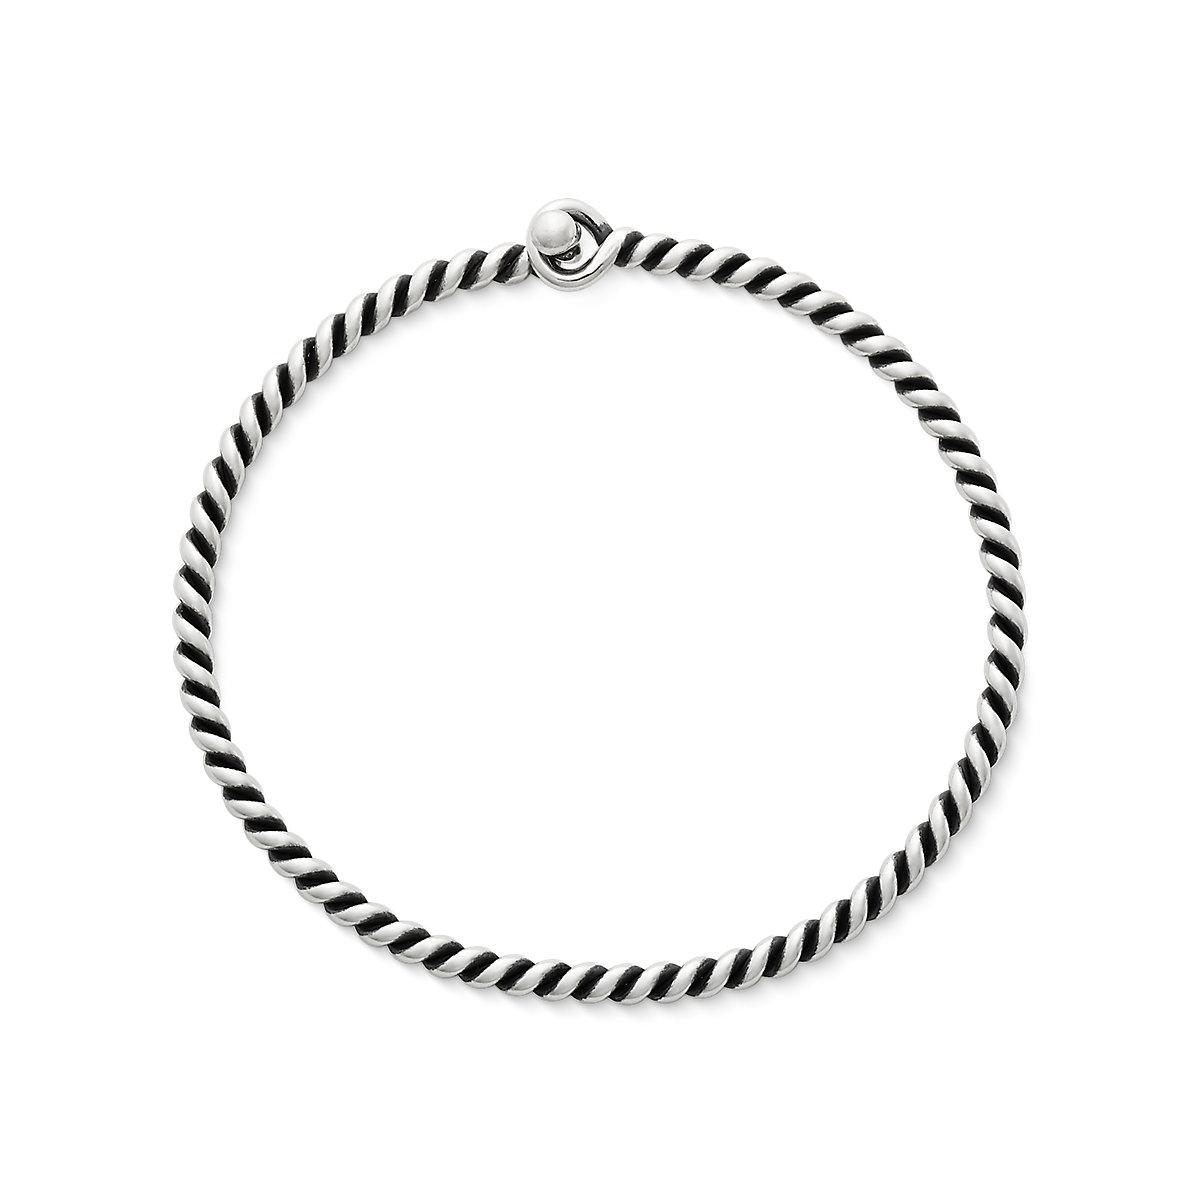 Twisted Wire Hook-On Bracelet - James Avery